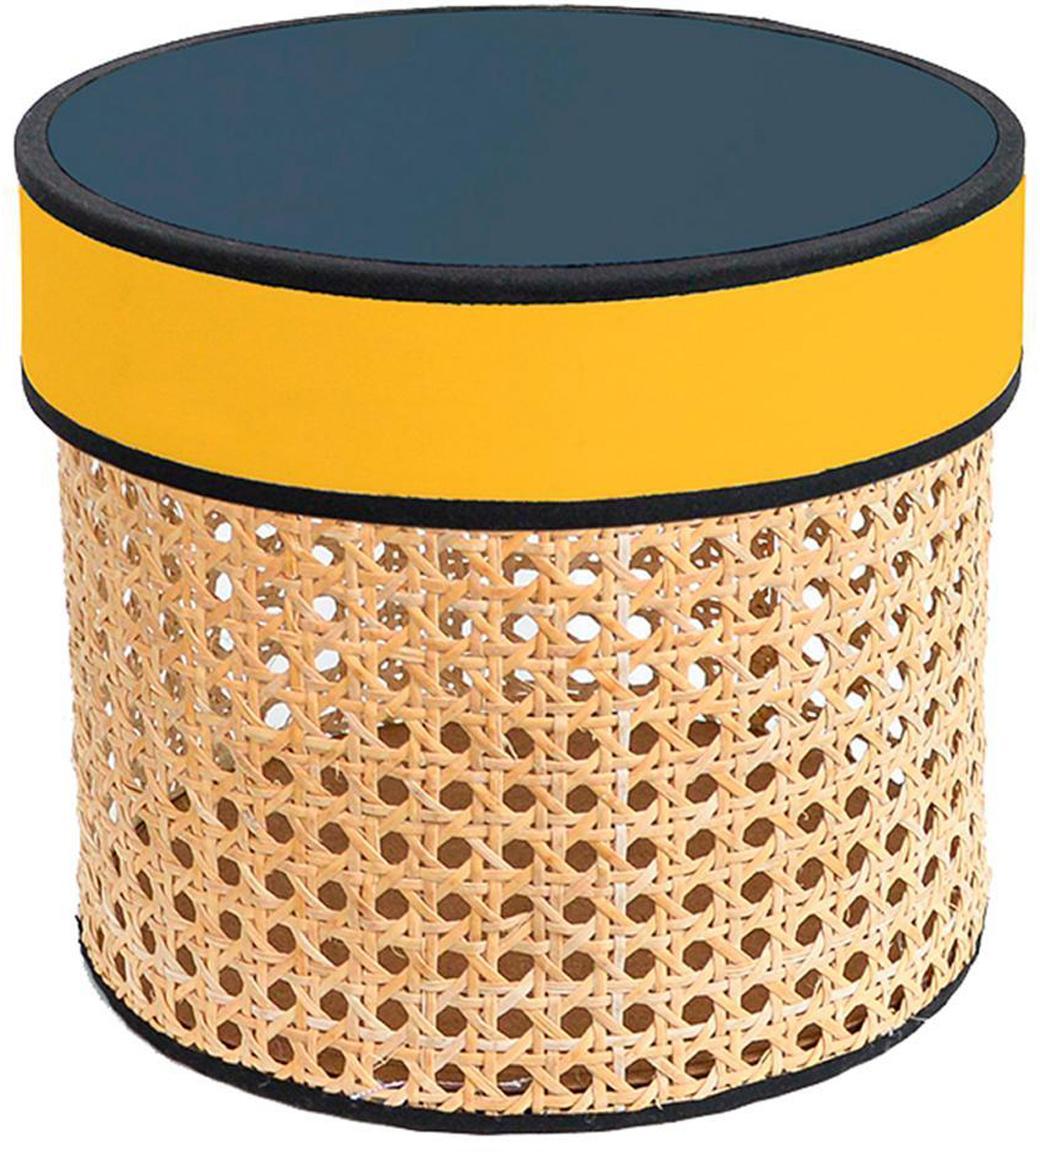 Caja decorativa Pamela, Caja: rejilla, Tapa: tela, fibras de densidad , Beige, amarillo, Ø 21 x Al 19 cm